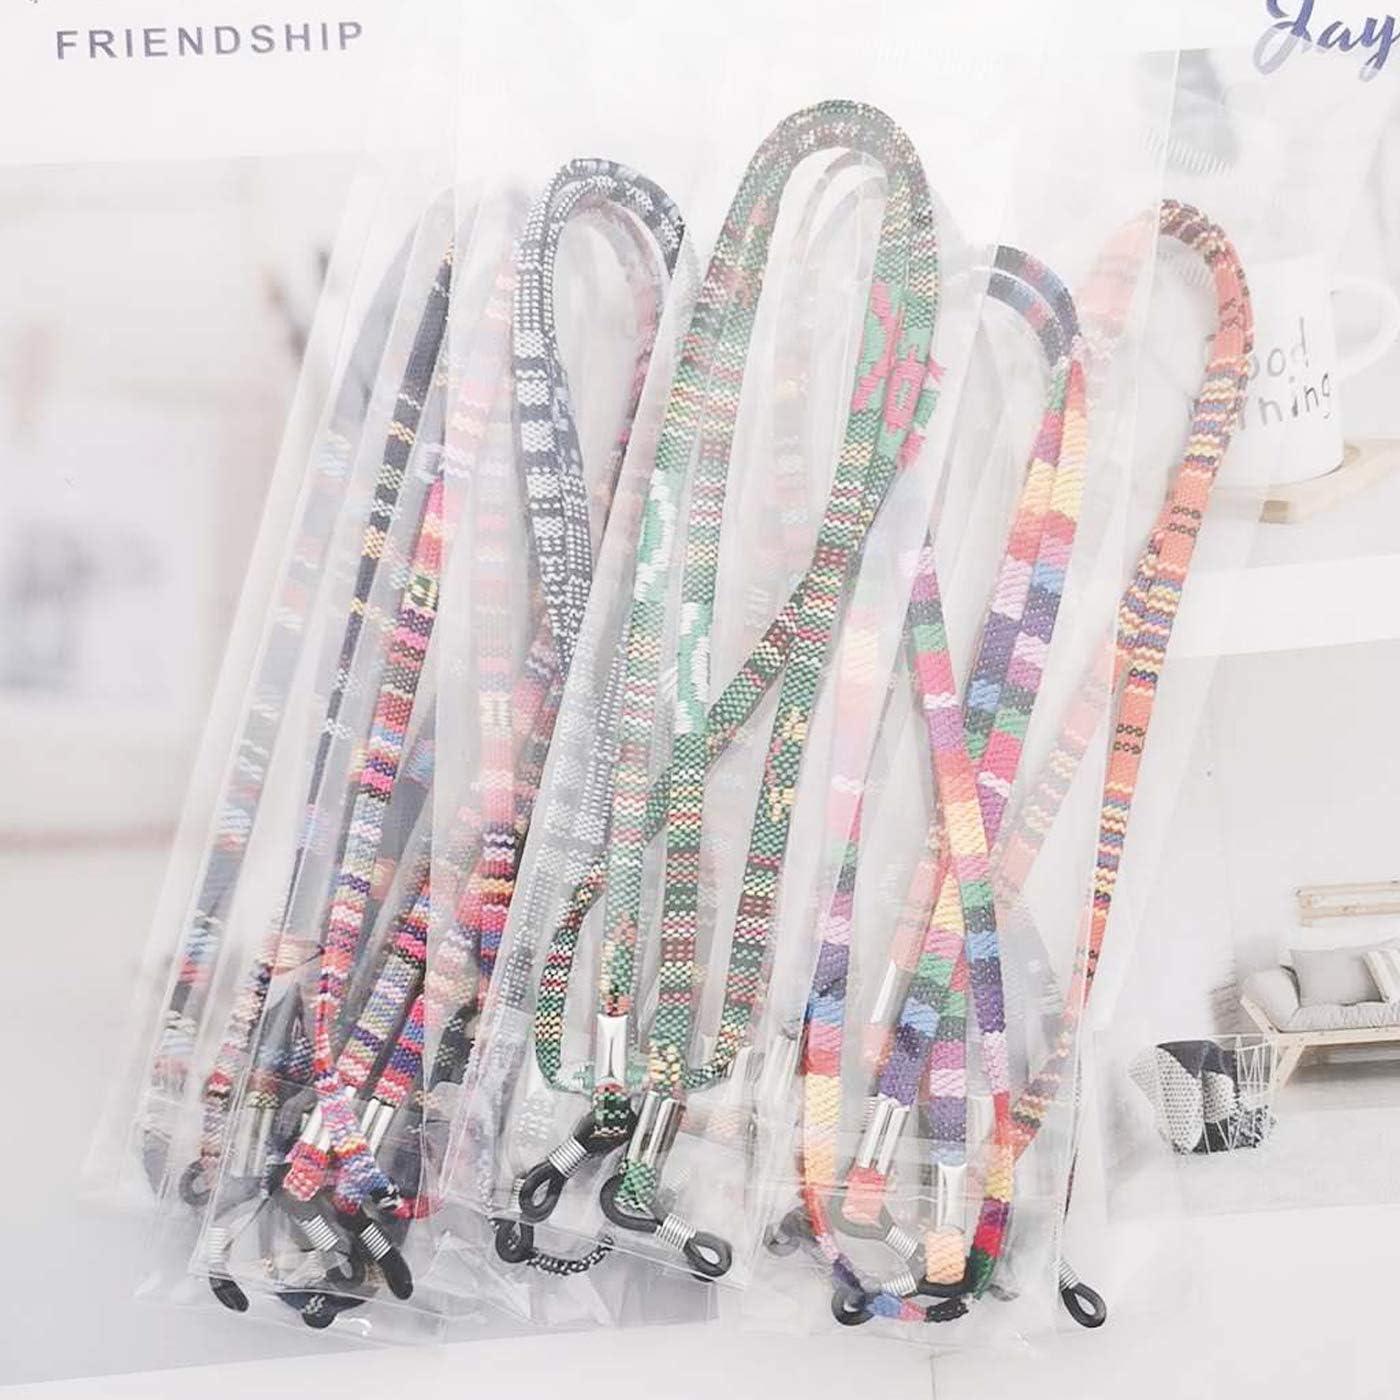 Colorful Markeny 12Pcs Glasses Strap Eyewear Retainer Sunglass Straps Safety Neck Holder Lanyard for Kids Women and Men